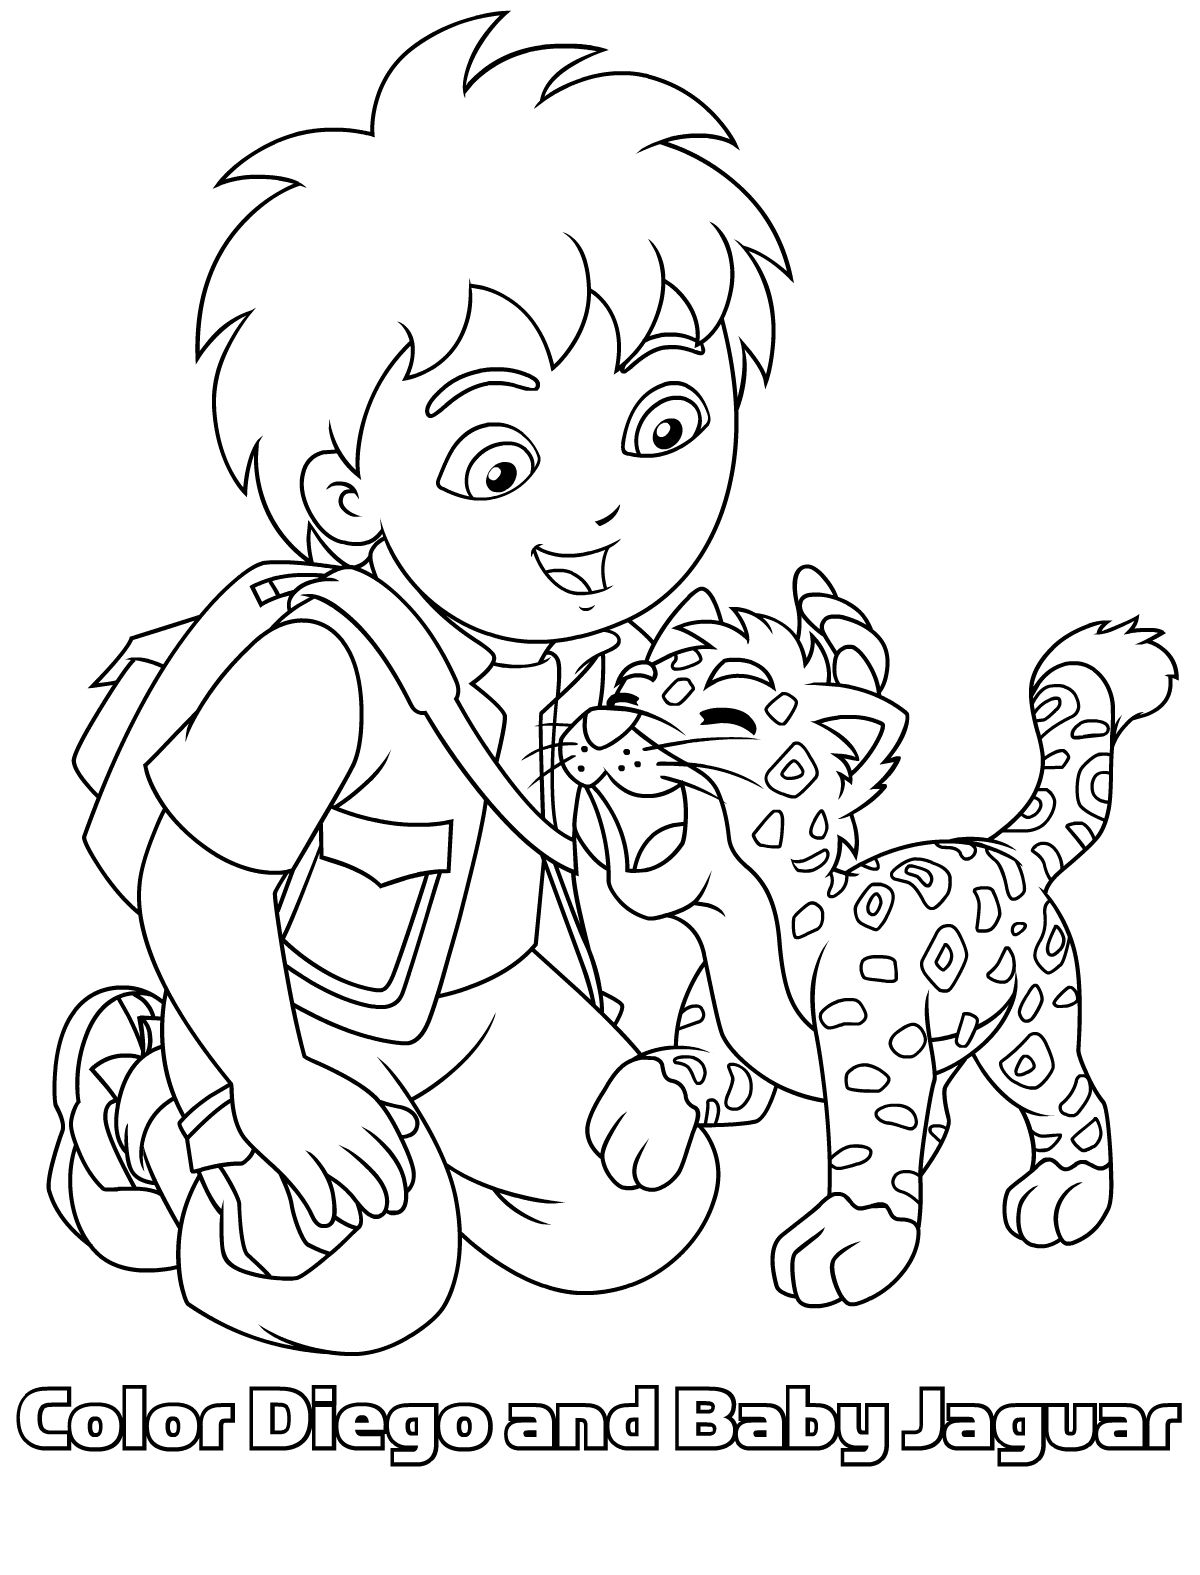 Coloring pages jaguar - Diego Coloring Pages